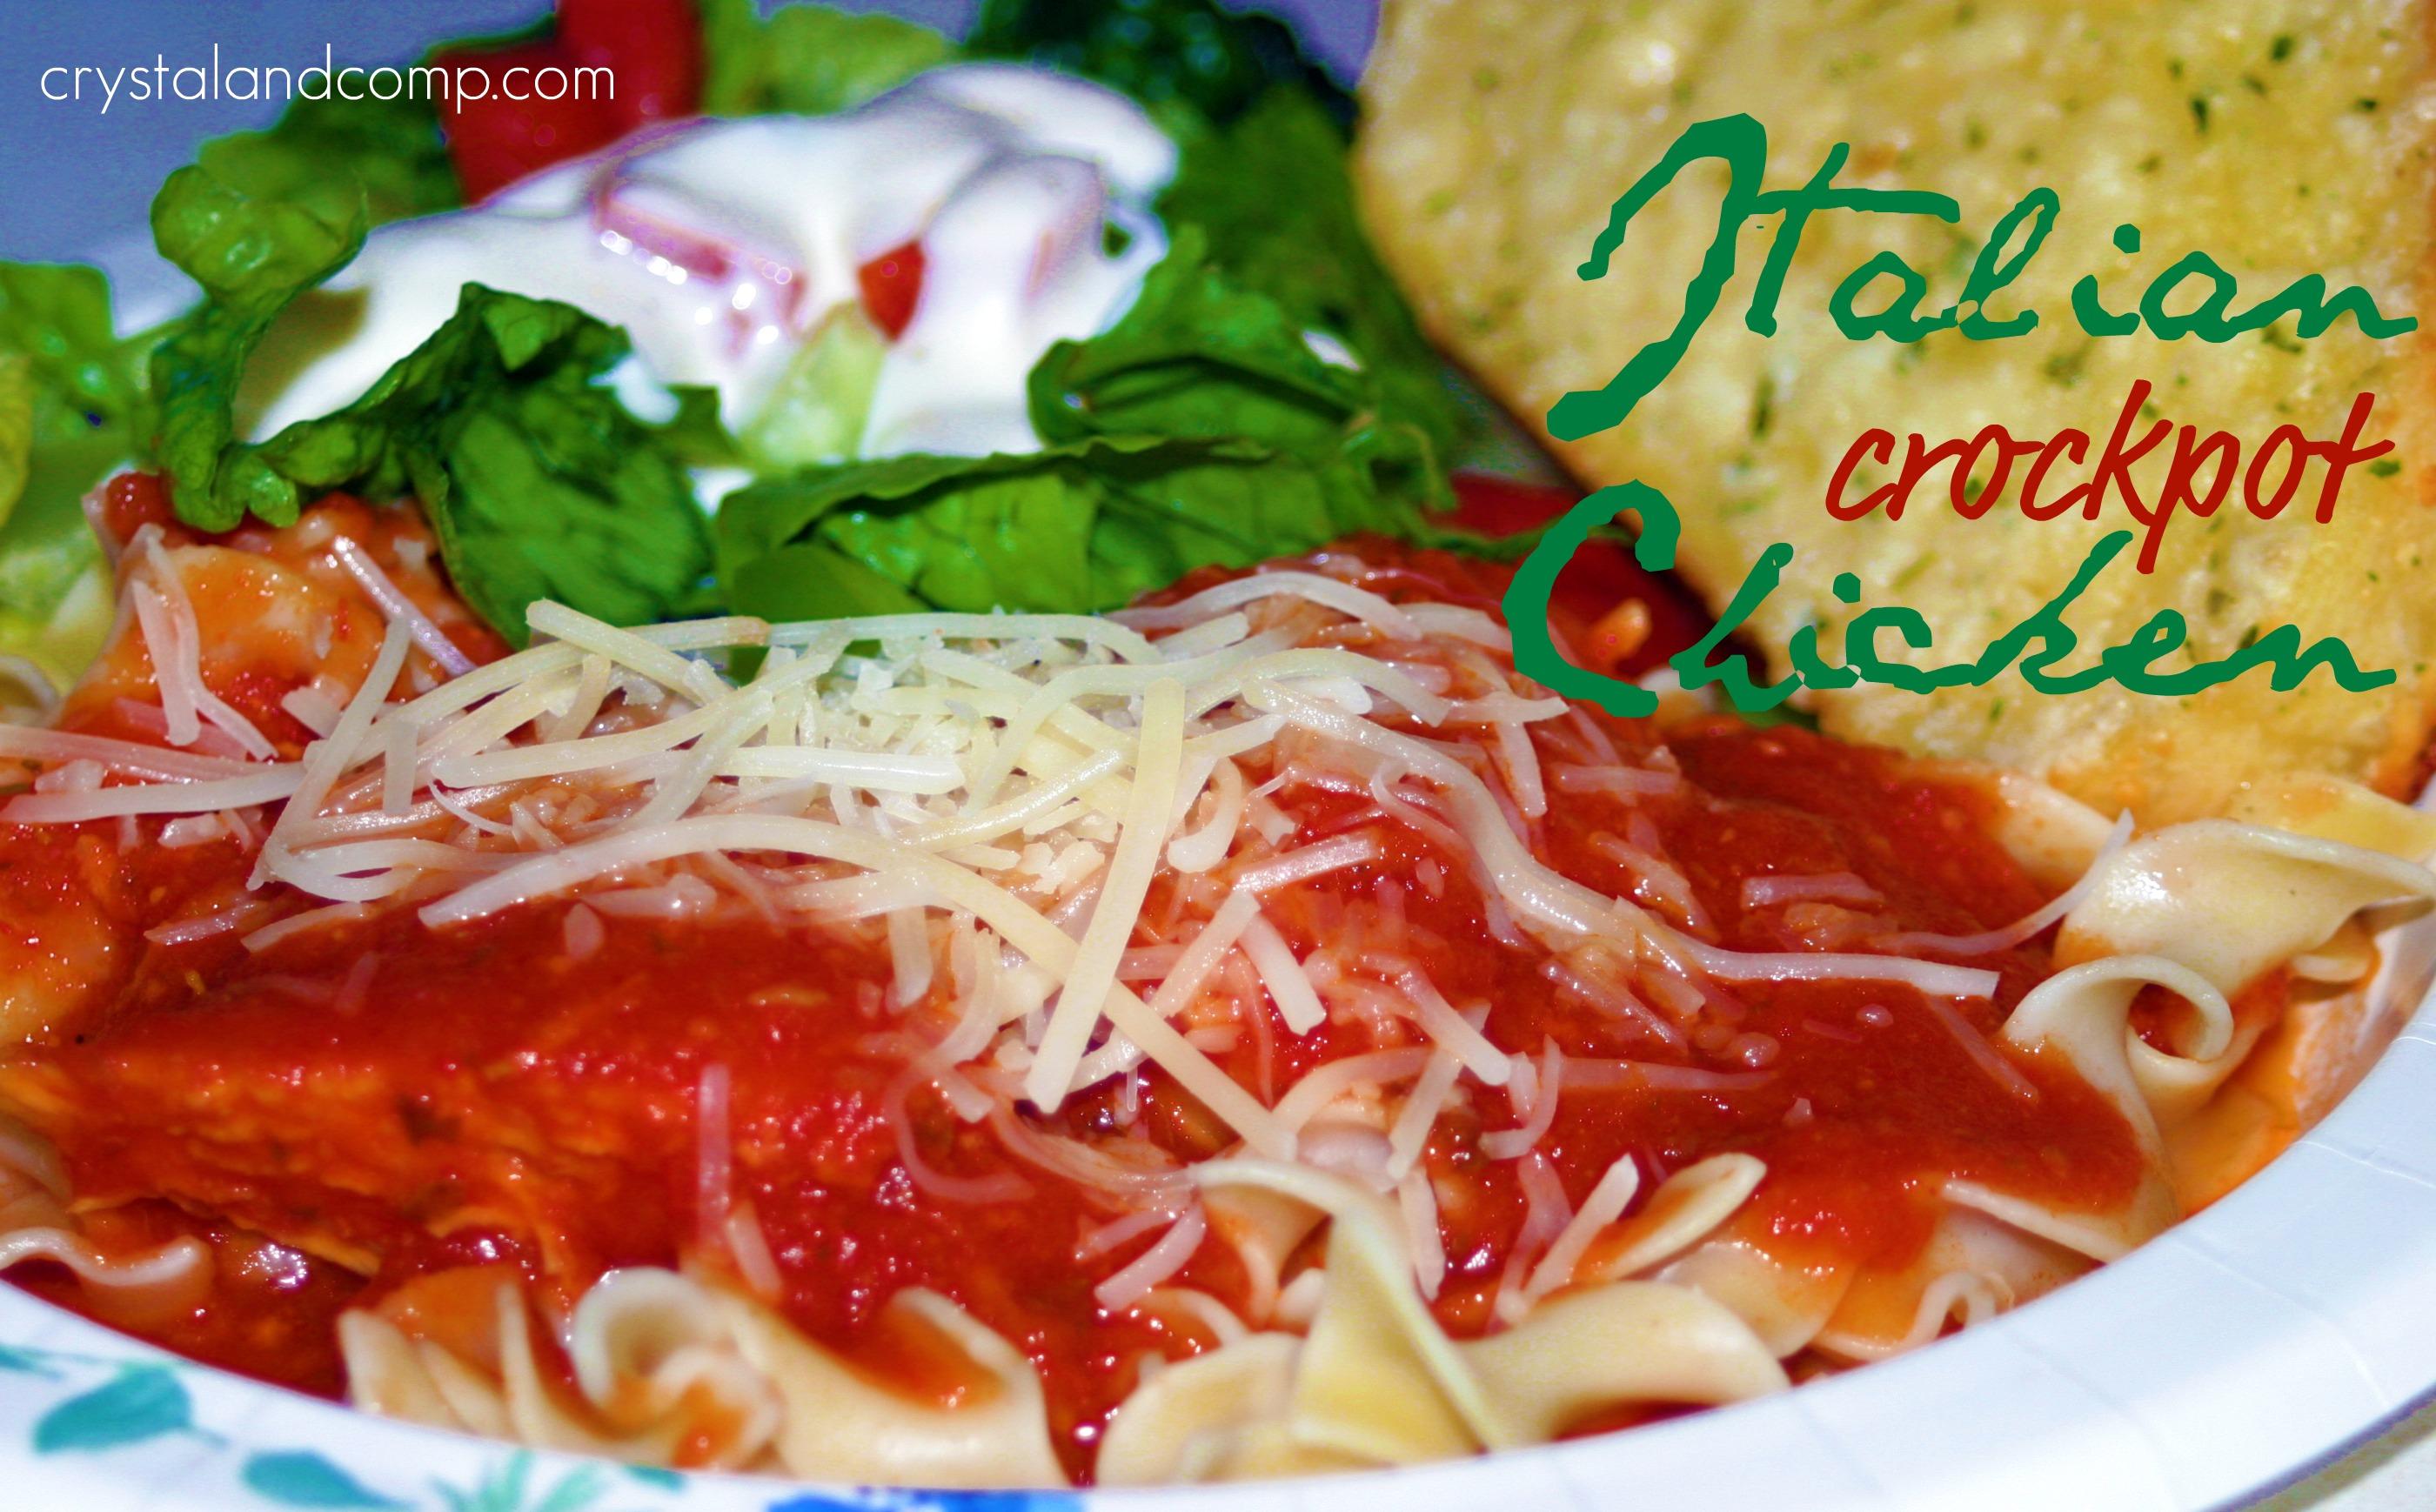 Crock pot chicken recipes pasta sauce